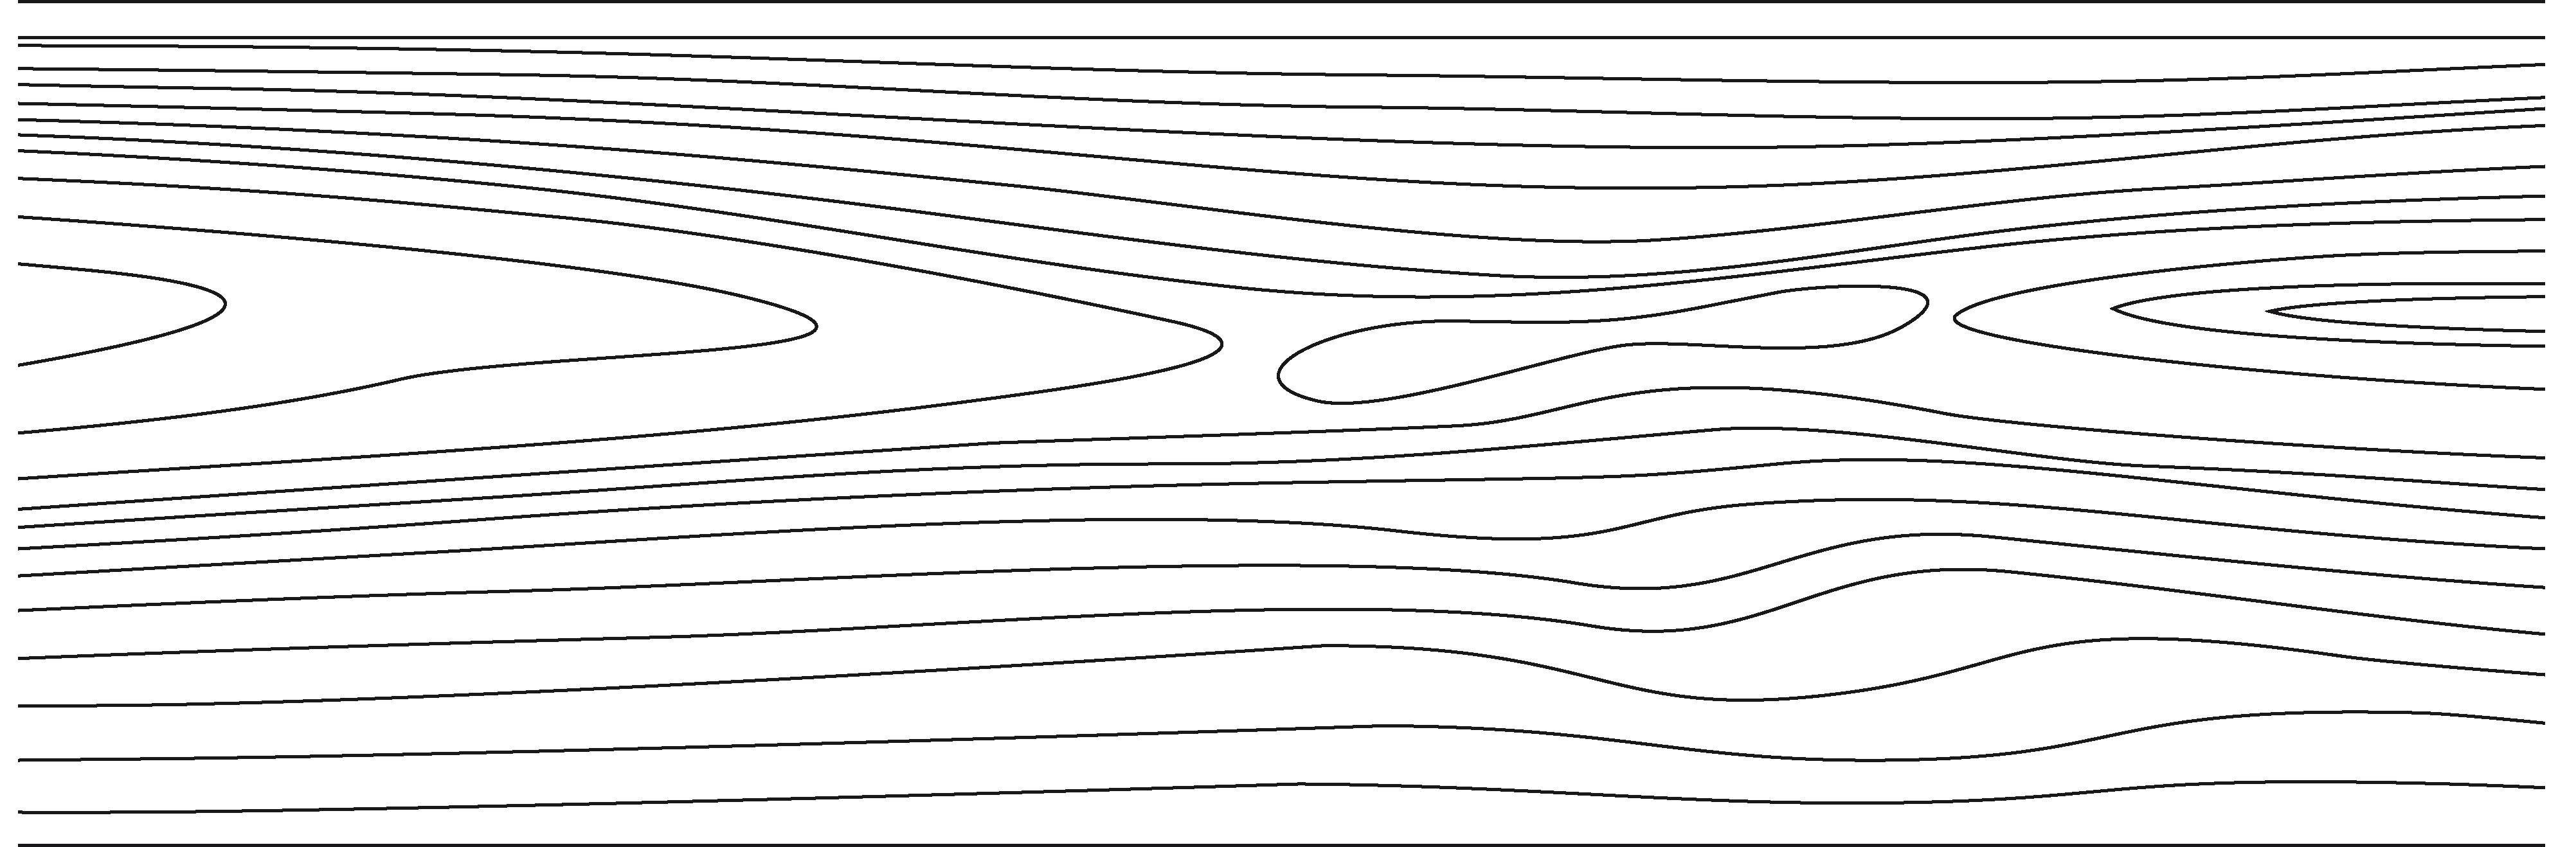 hout-dikkerelijn